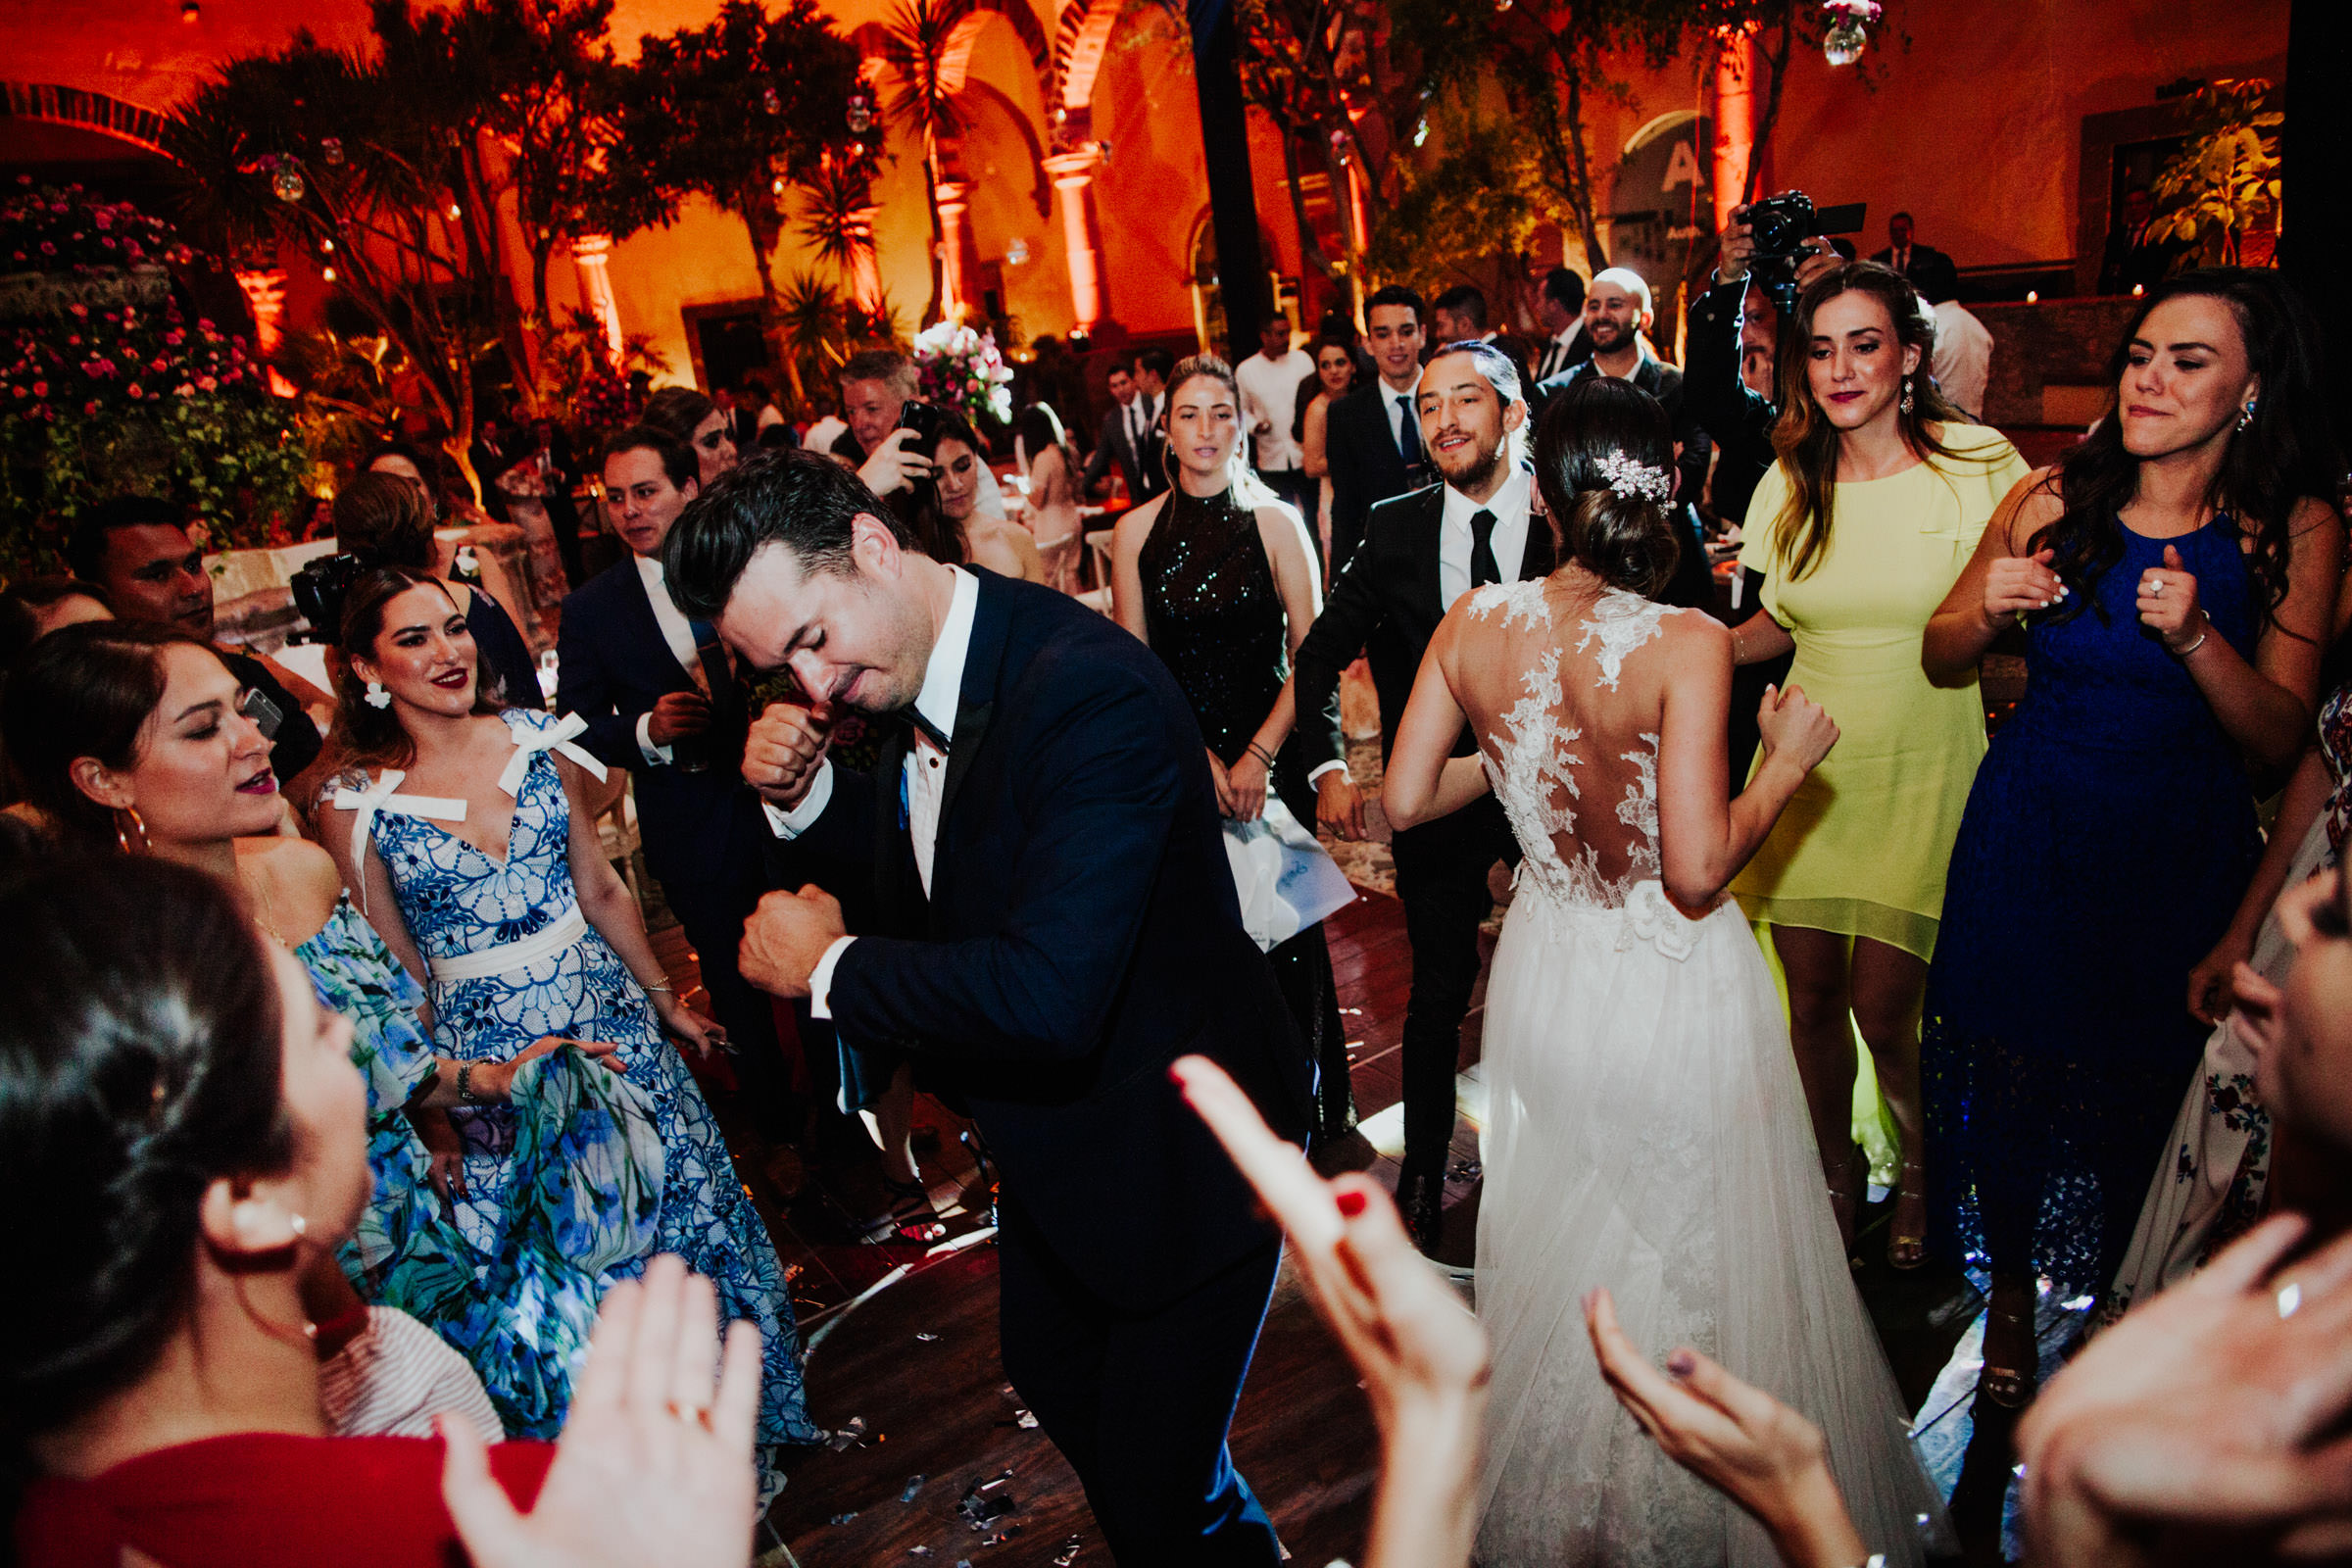 San-Miguel-de-Allende-Wedding-Photography-Parroquia-Instituto-Boda-Fotografia-Fer-Sergio-Pierce-Lifestyle-Photography0045.JPG